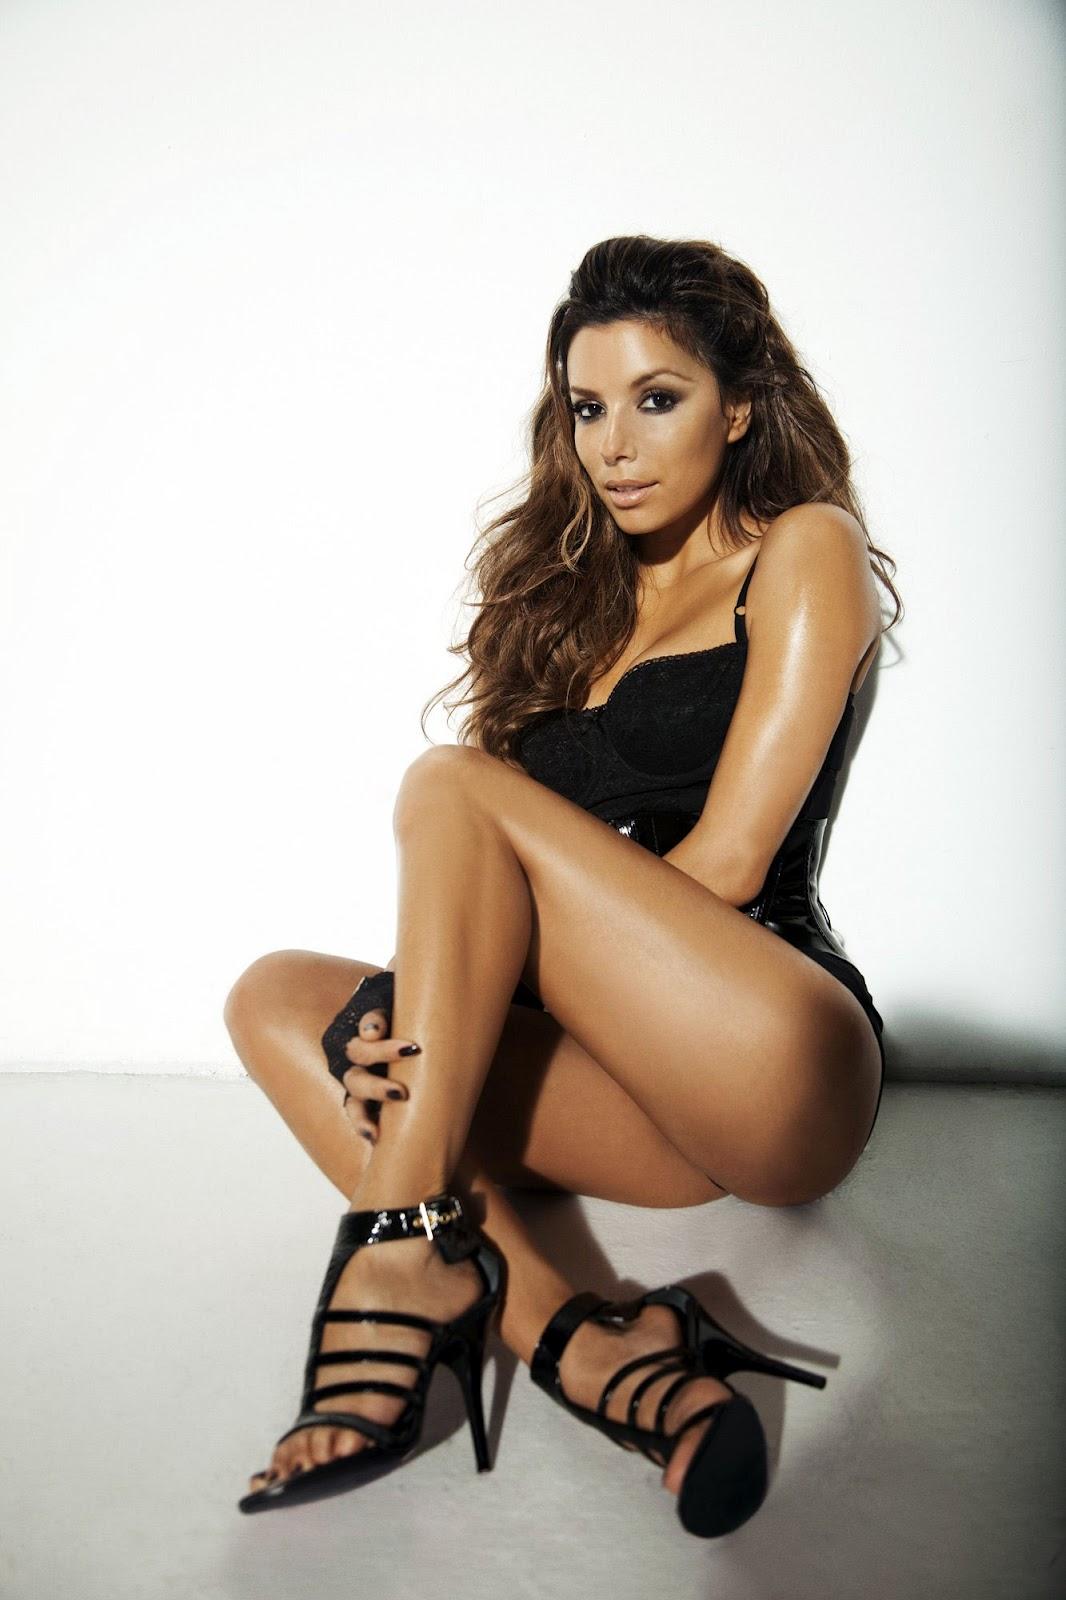 http://1.bp.blogspot.com/-bpOhXIPrNOM/UDh_EoN-lPI/AAAAAAAAAuw/5Z51tfVTaks/s1600/eva-longoria-gq-mexico-sexy-leather-magazine-lossip.jpg